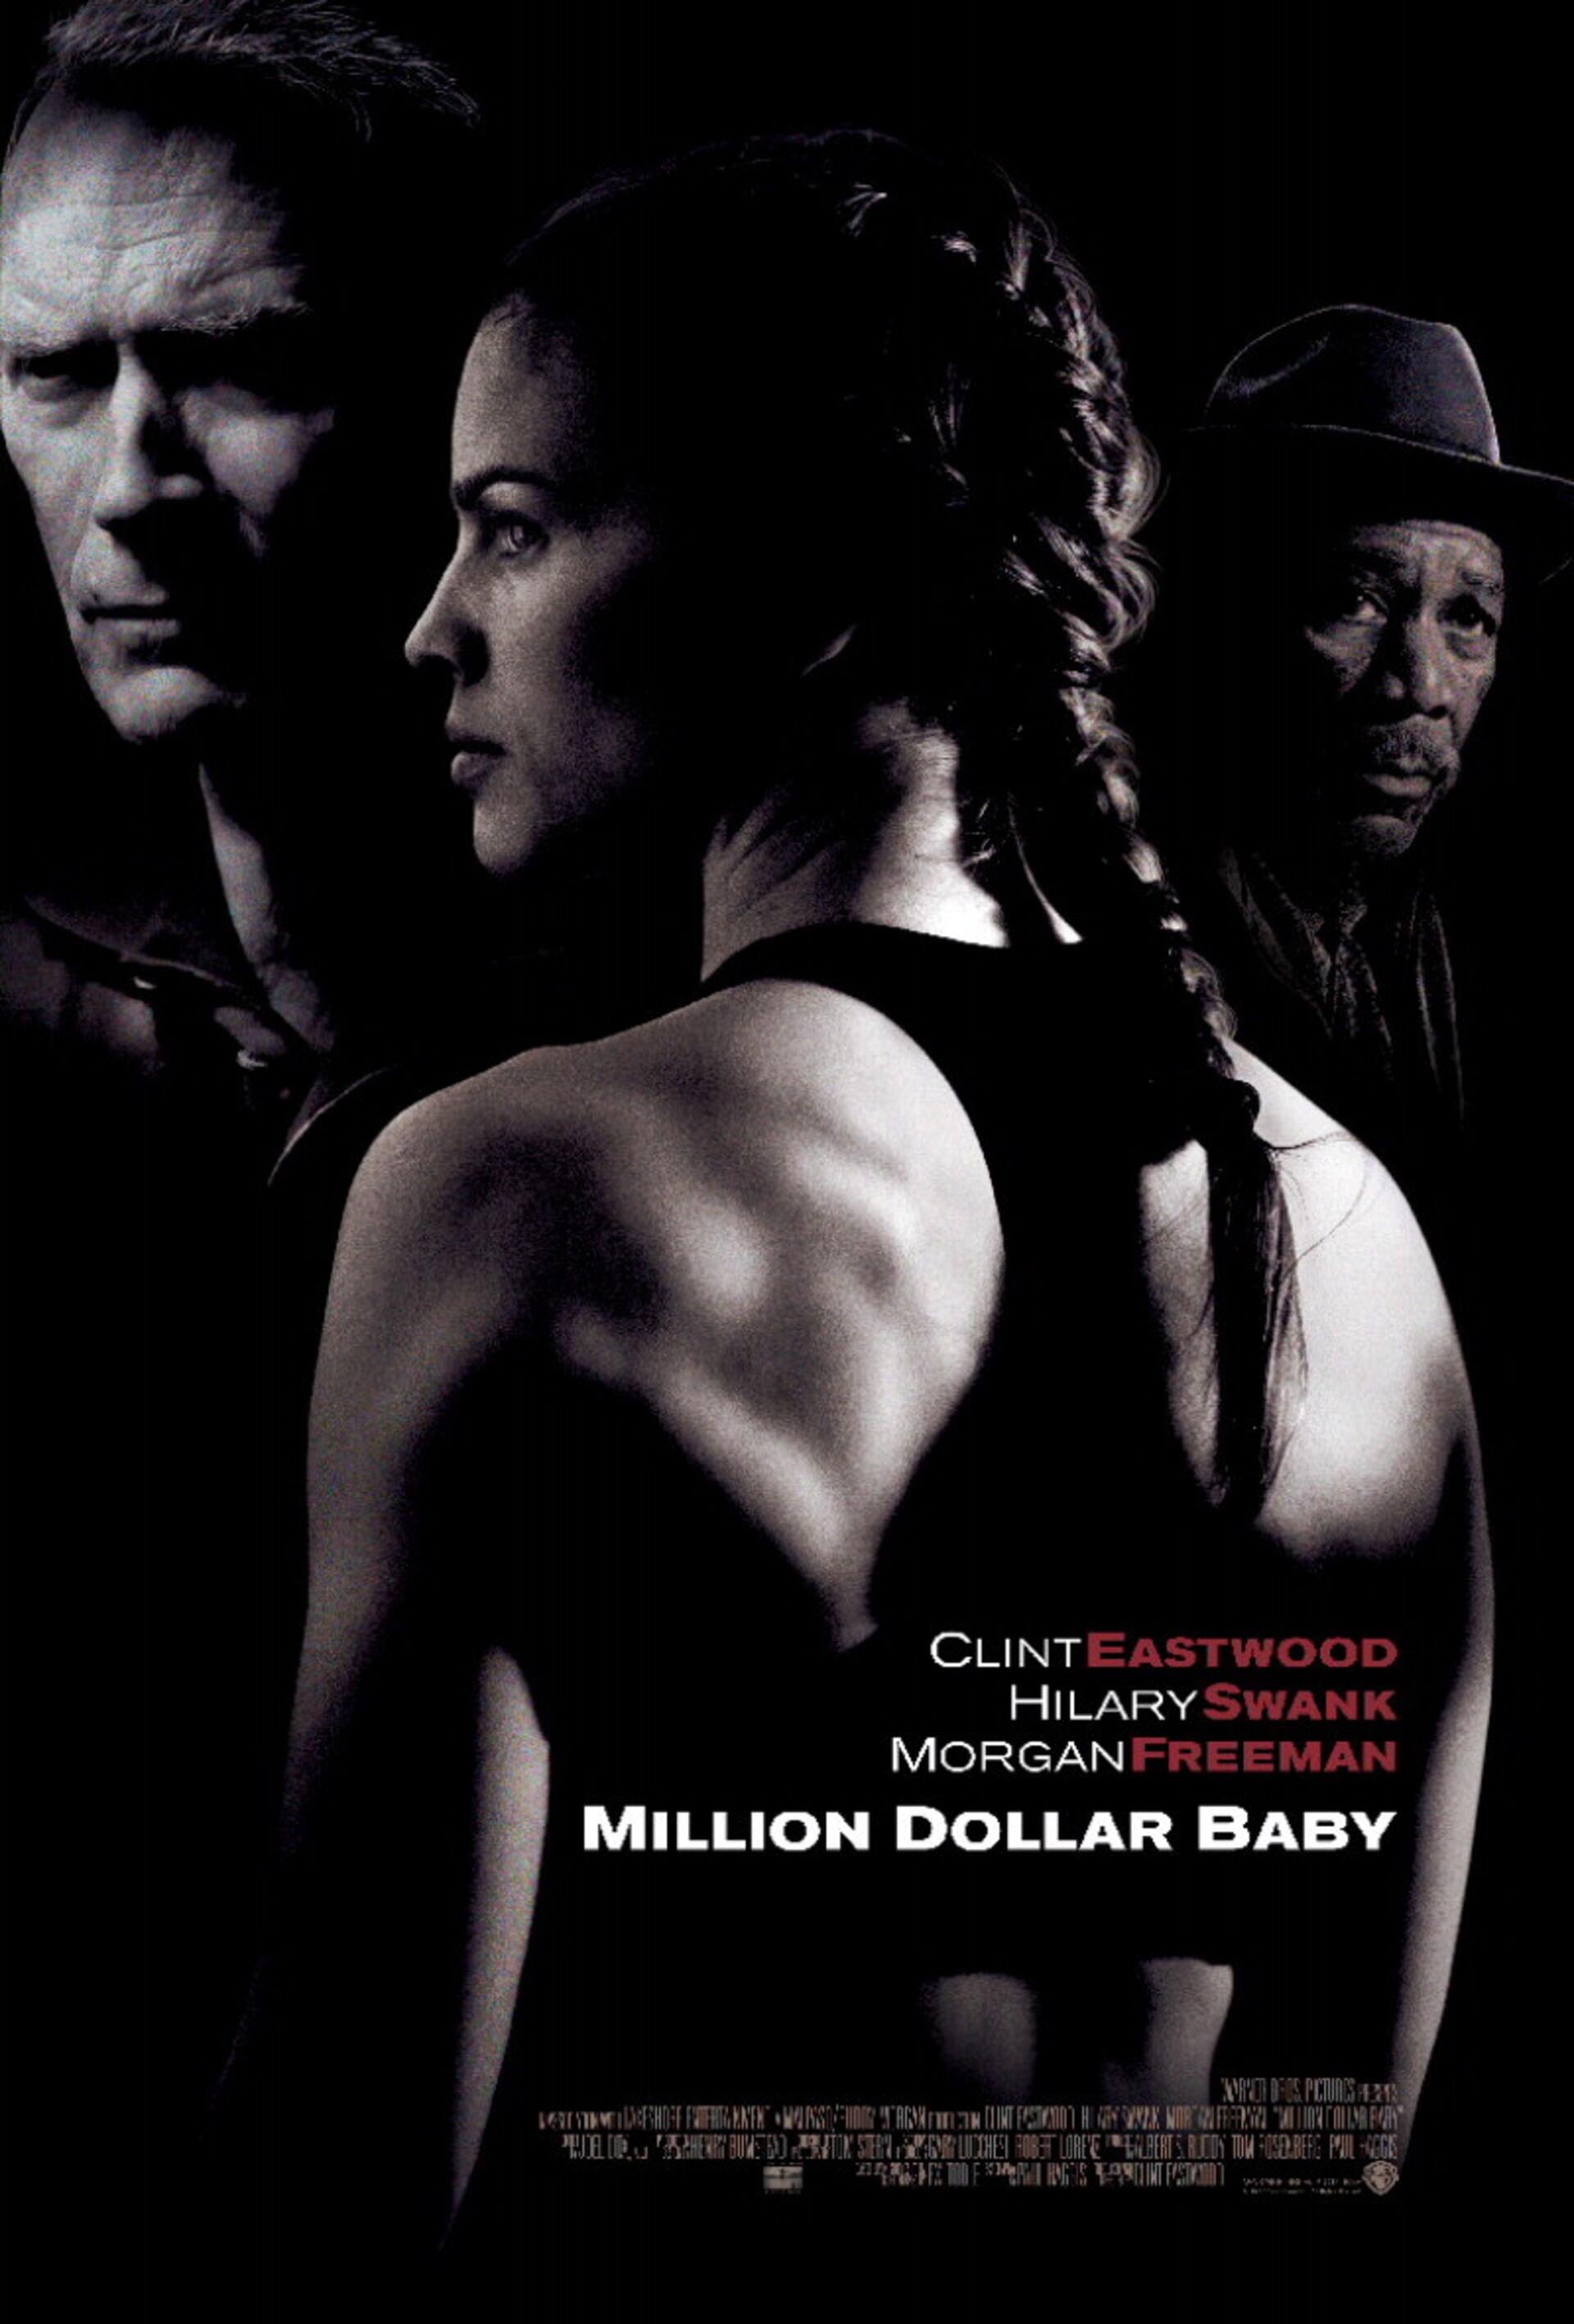 Million Dollar Baby - Poster 1